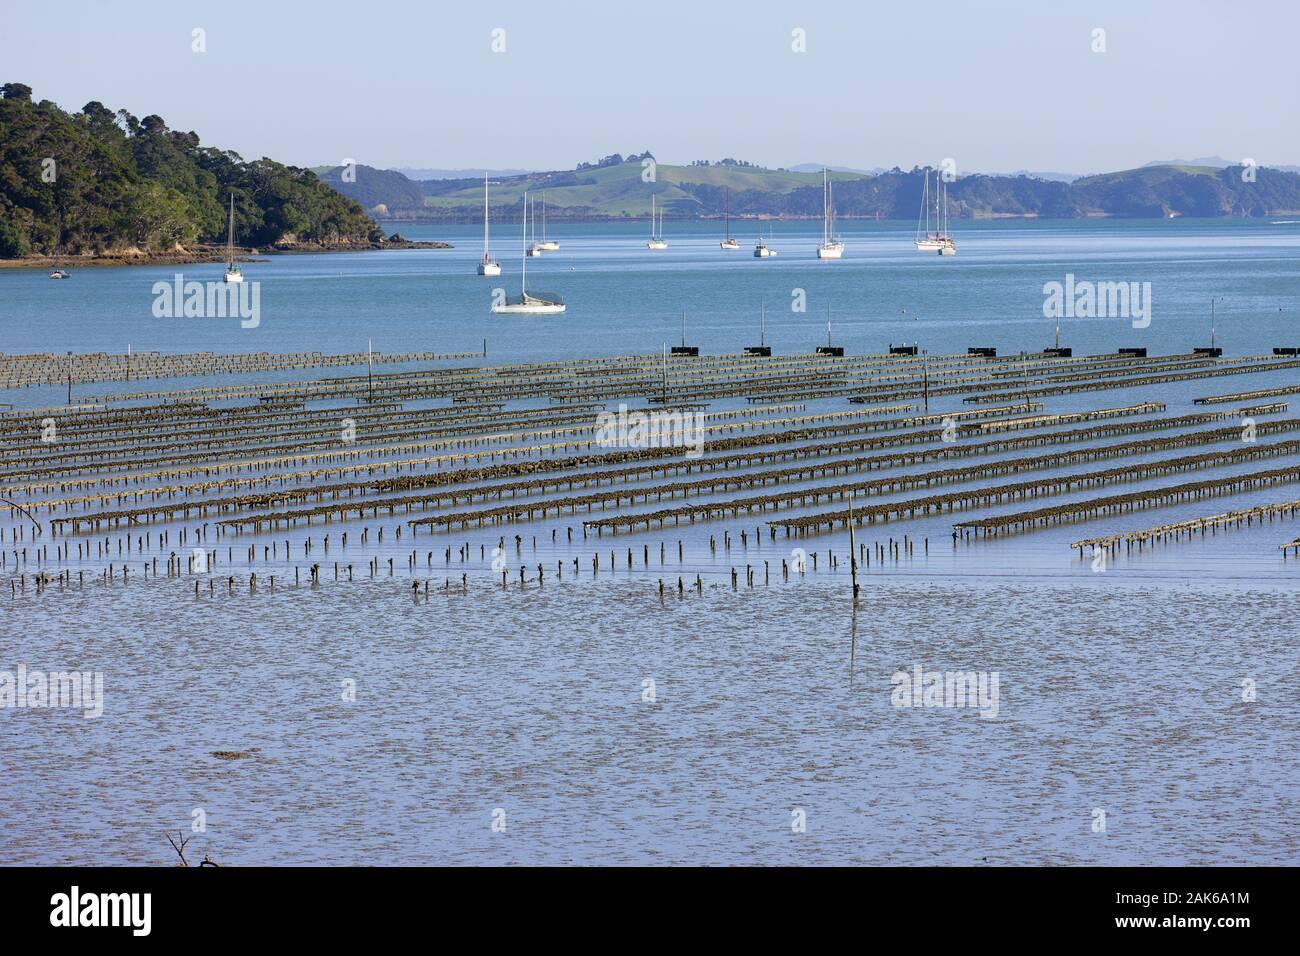 Nordinsel/Northland: Russel, Austernbank in der Bay of Islands, Neuseeland | usage worldwide Stock Photo